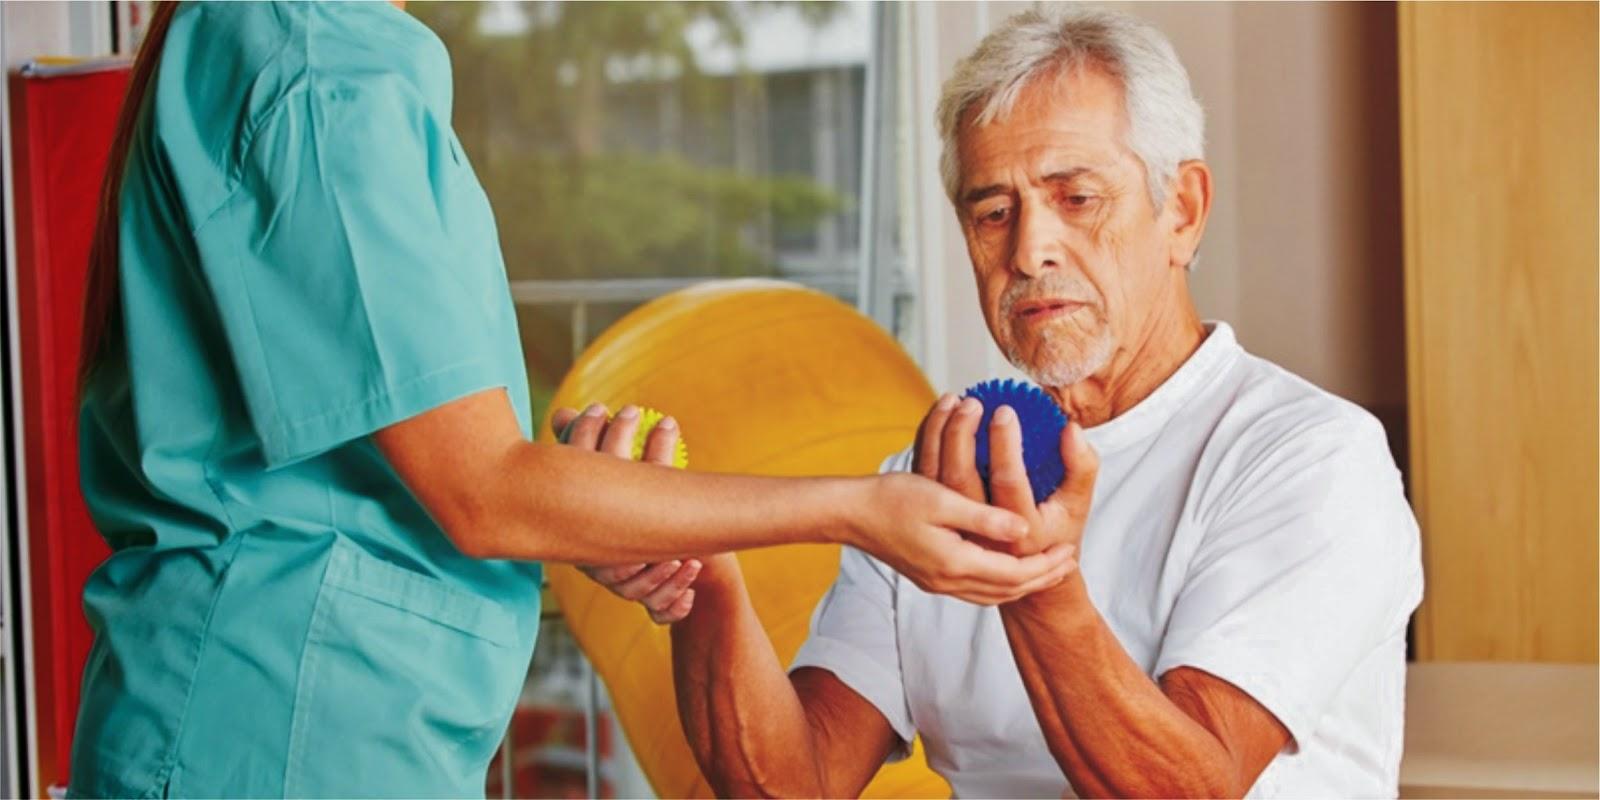 Mengenal Penyakit Stroke & Asuransi Penyakit Kritis